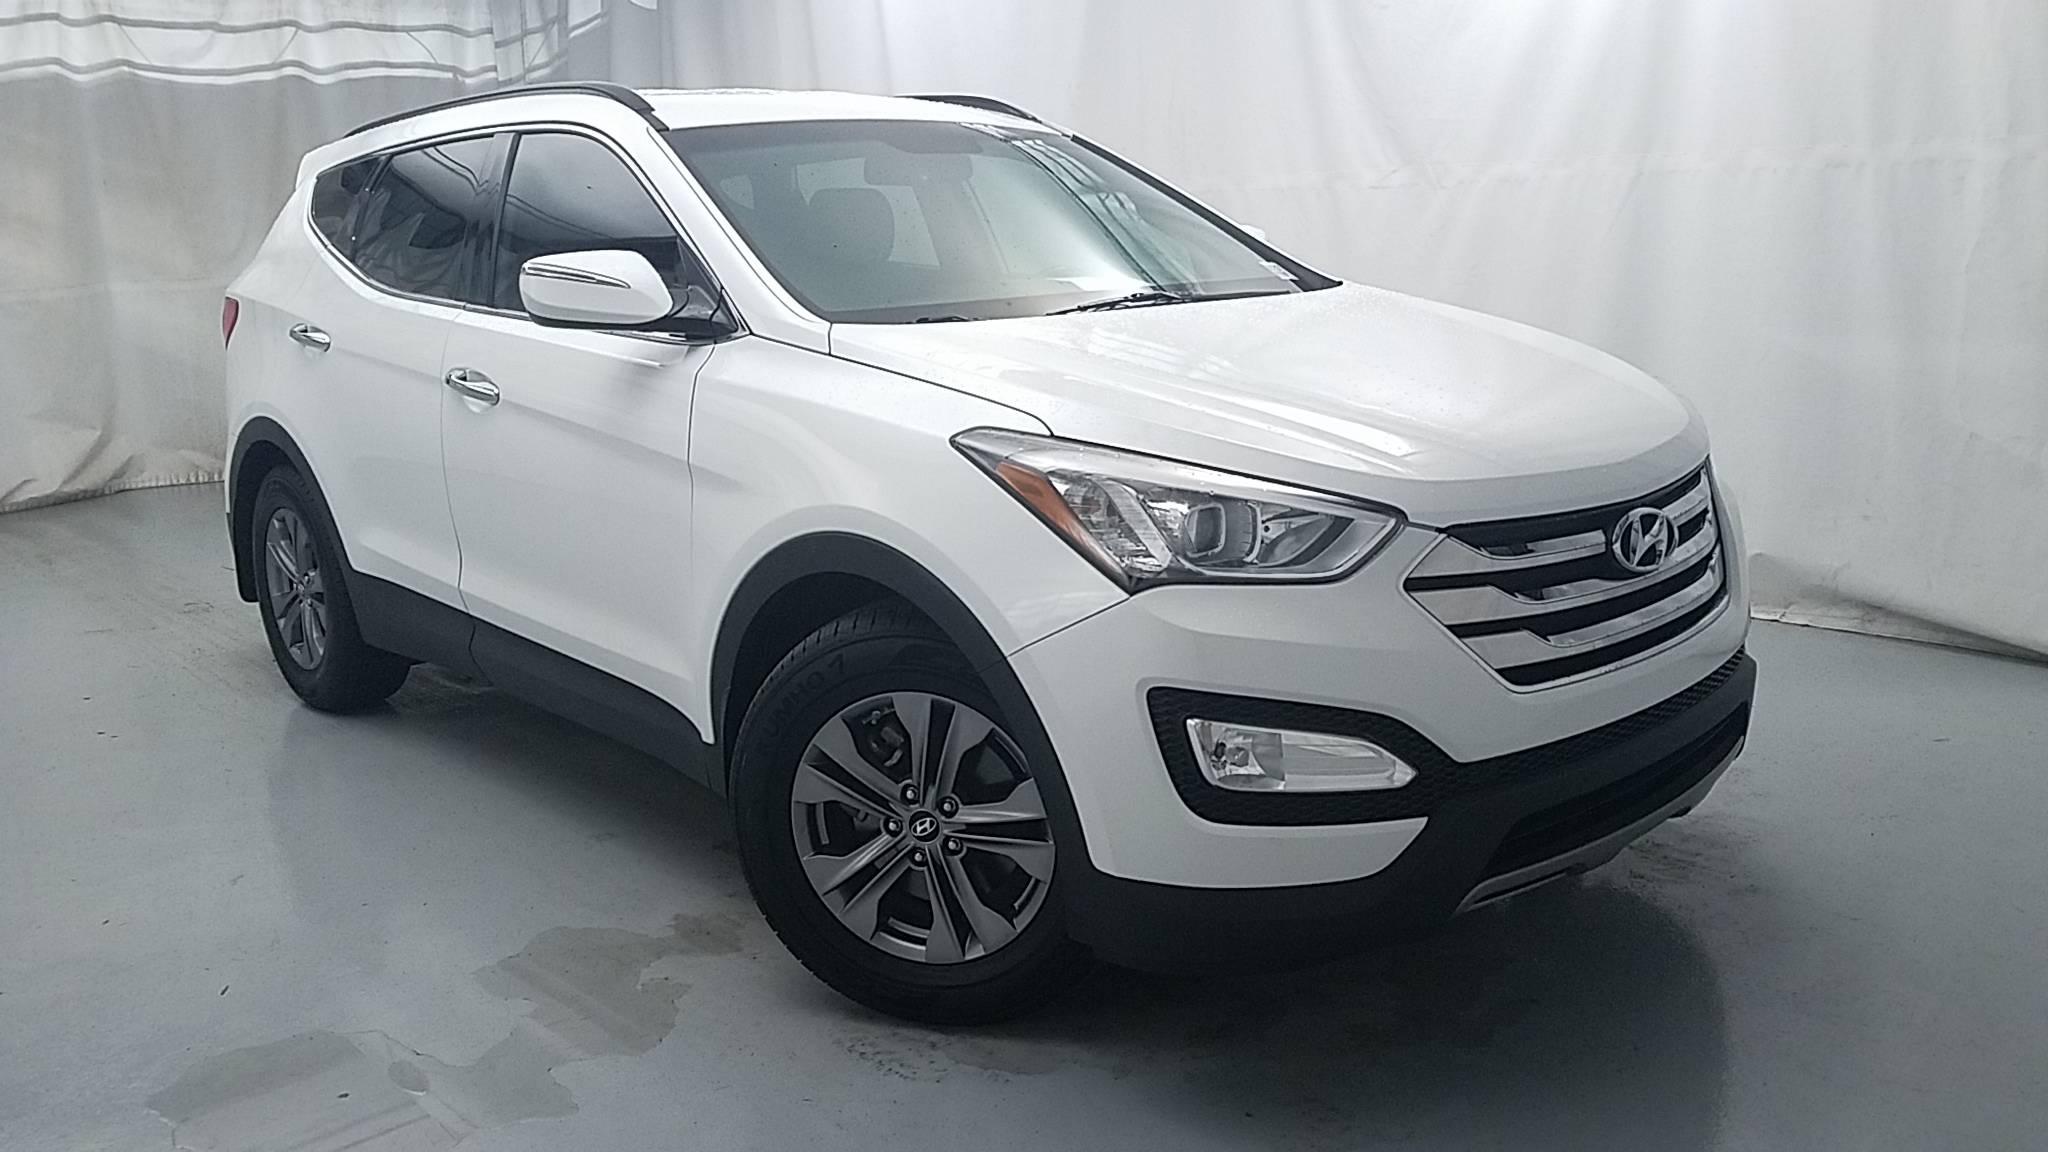 Used Hyundai Accent Vehicles for Sale in Hammond LA